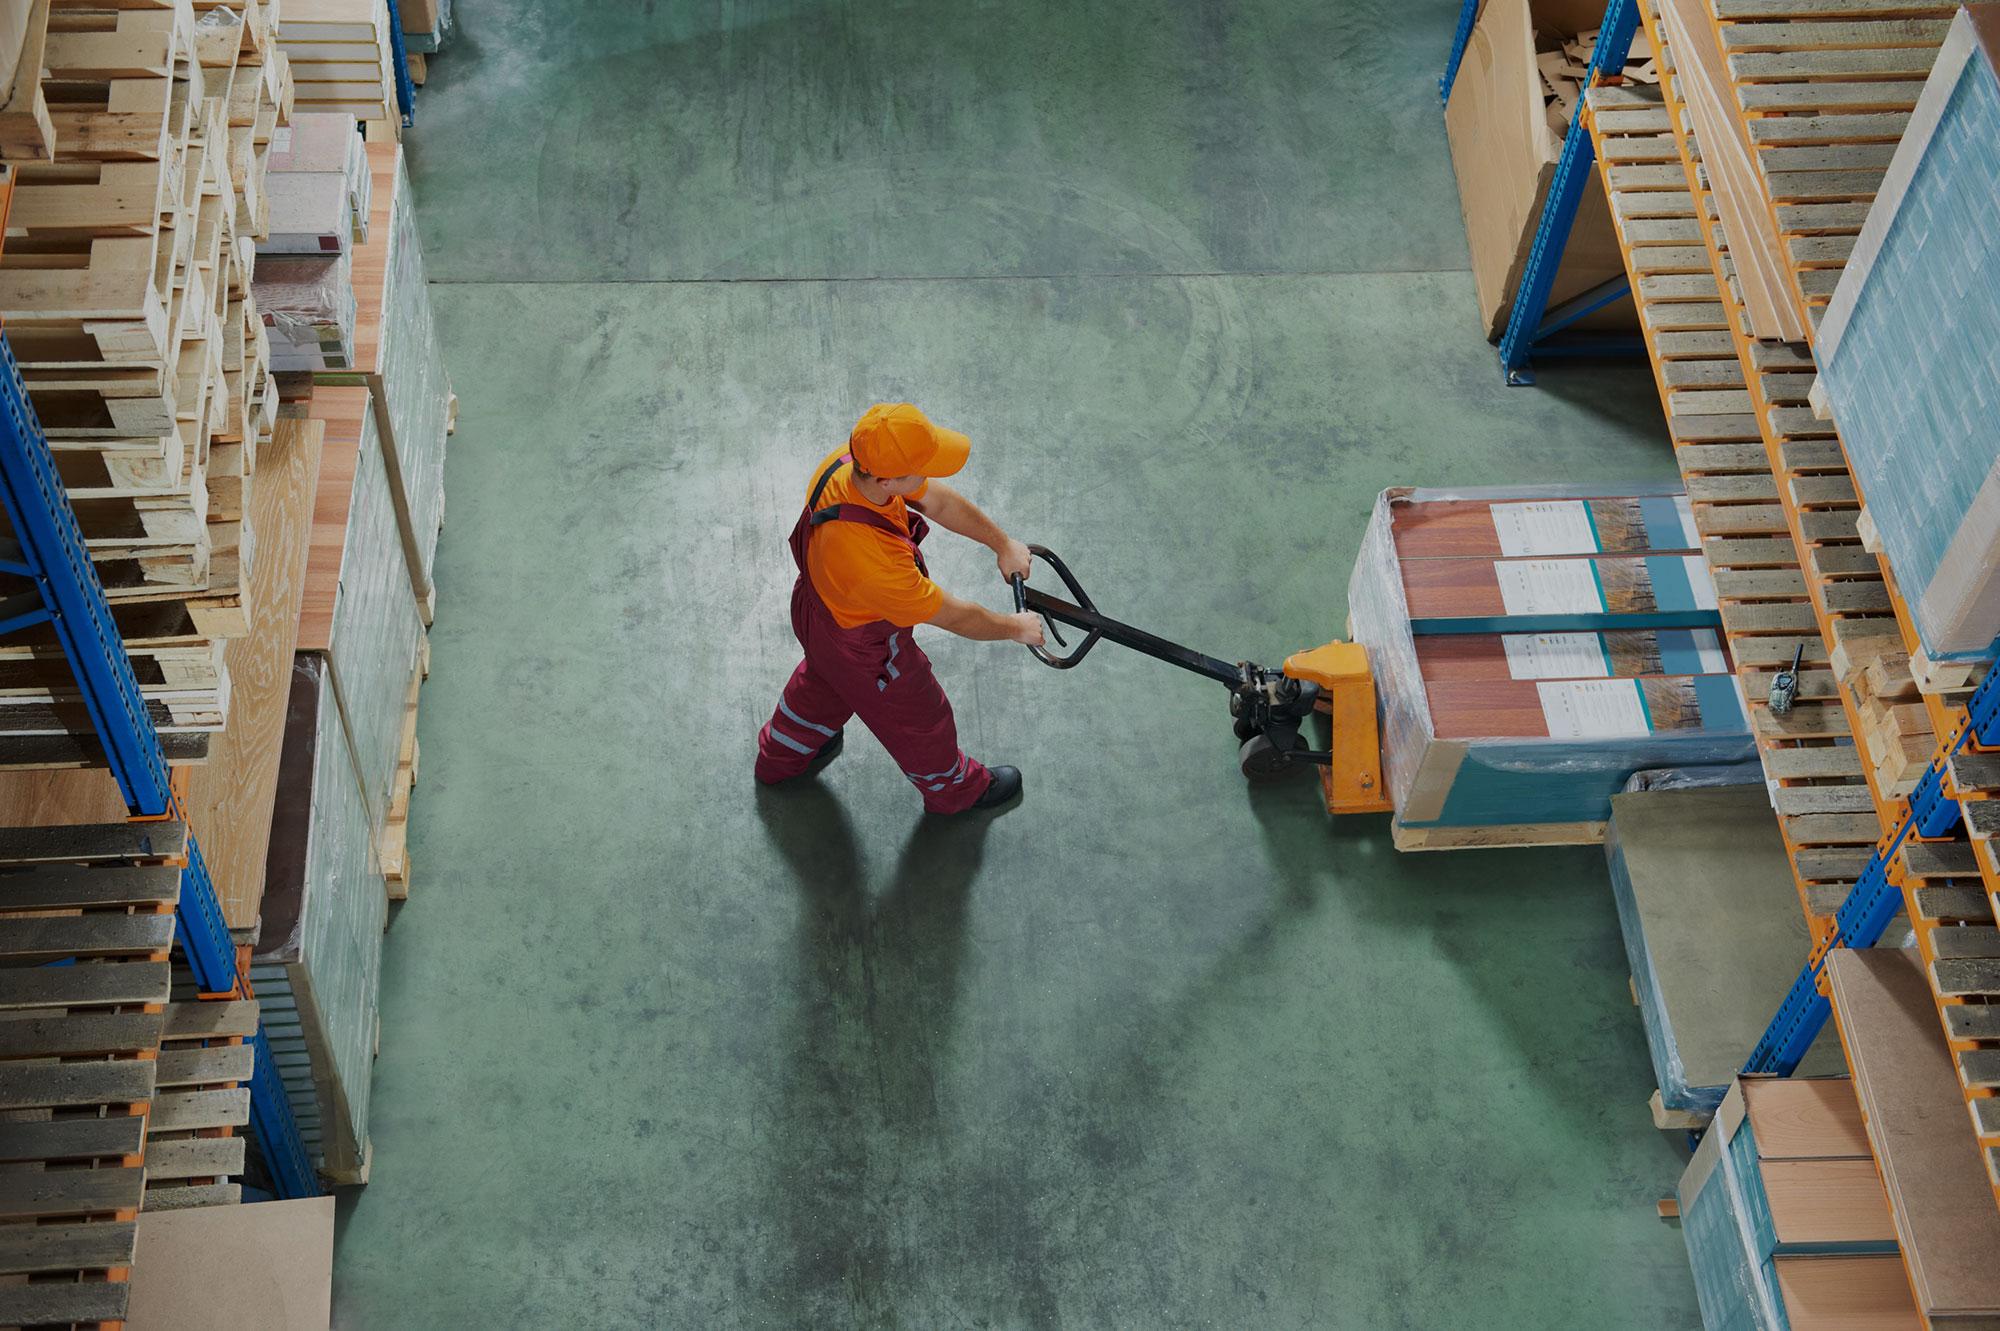 LTL Freight Services